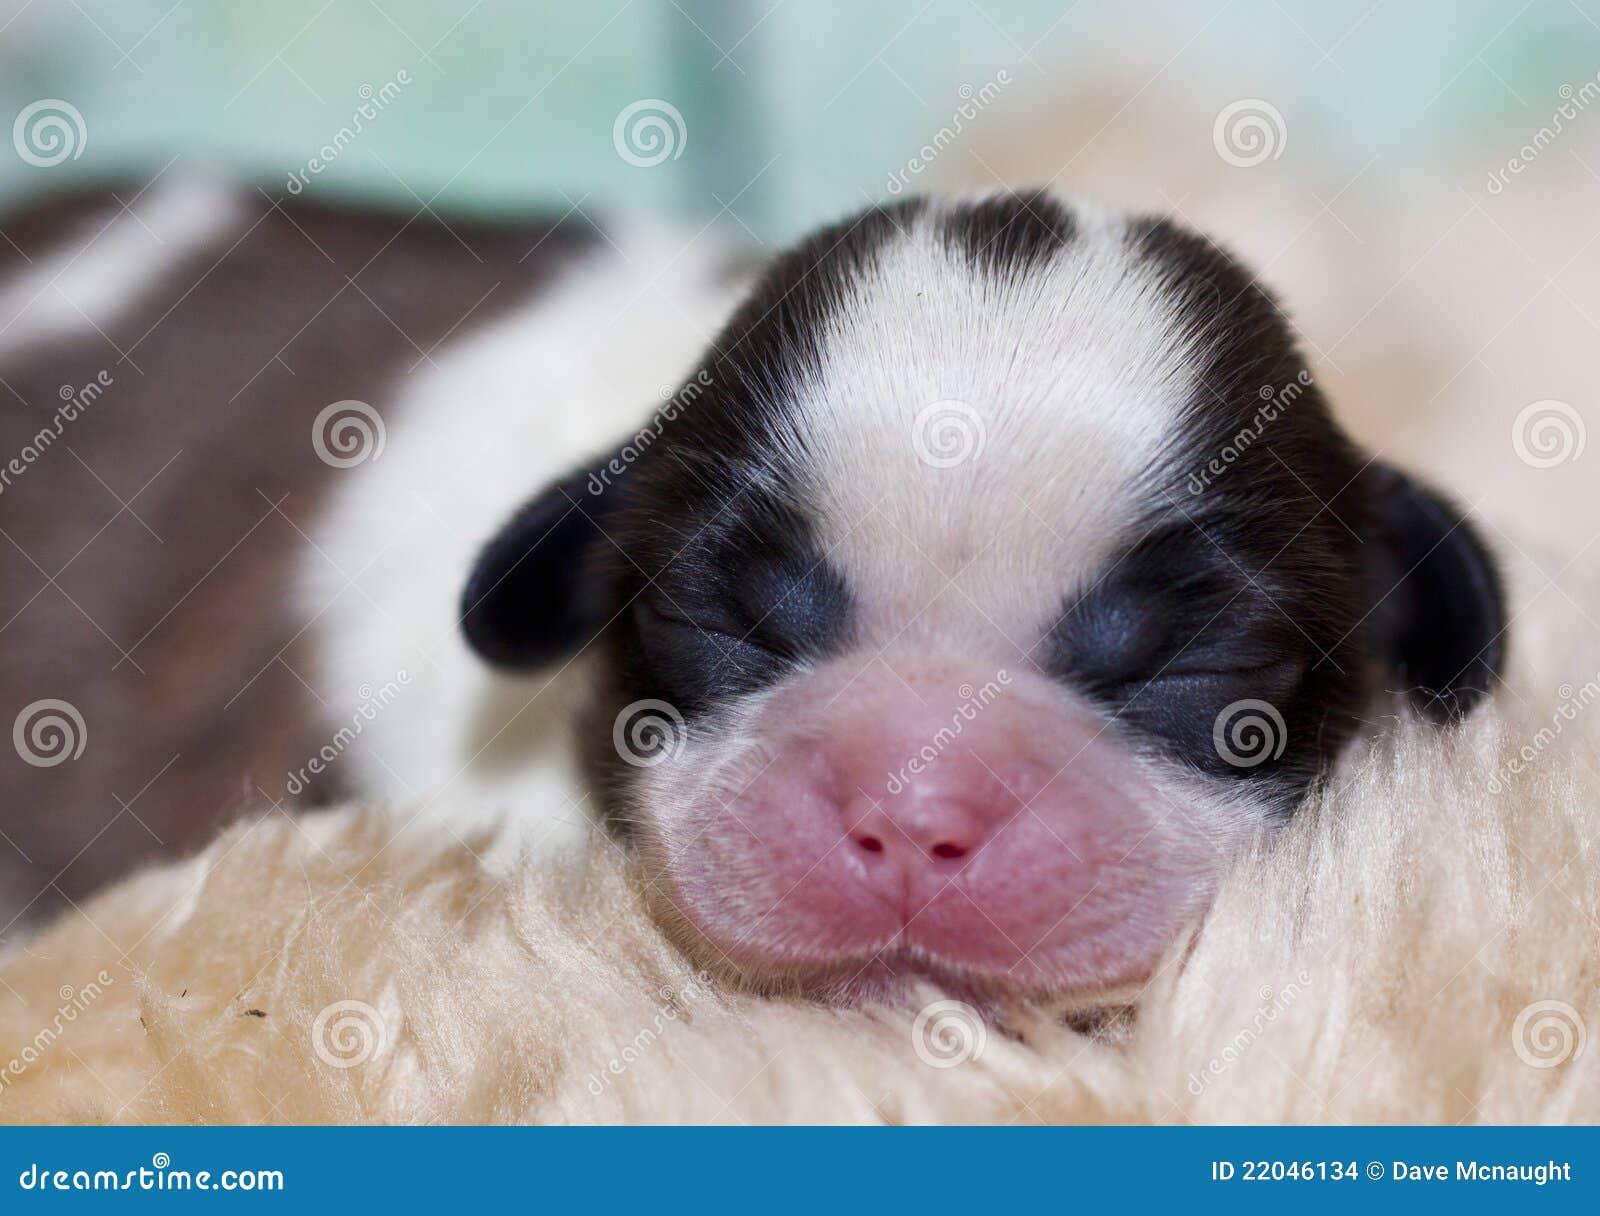 Imagenes de archivo: Perro de perrito de Shih Tzu